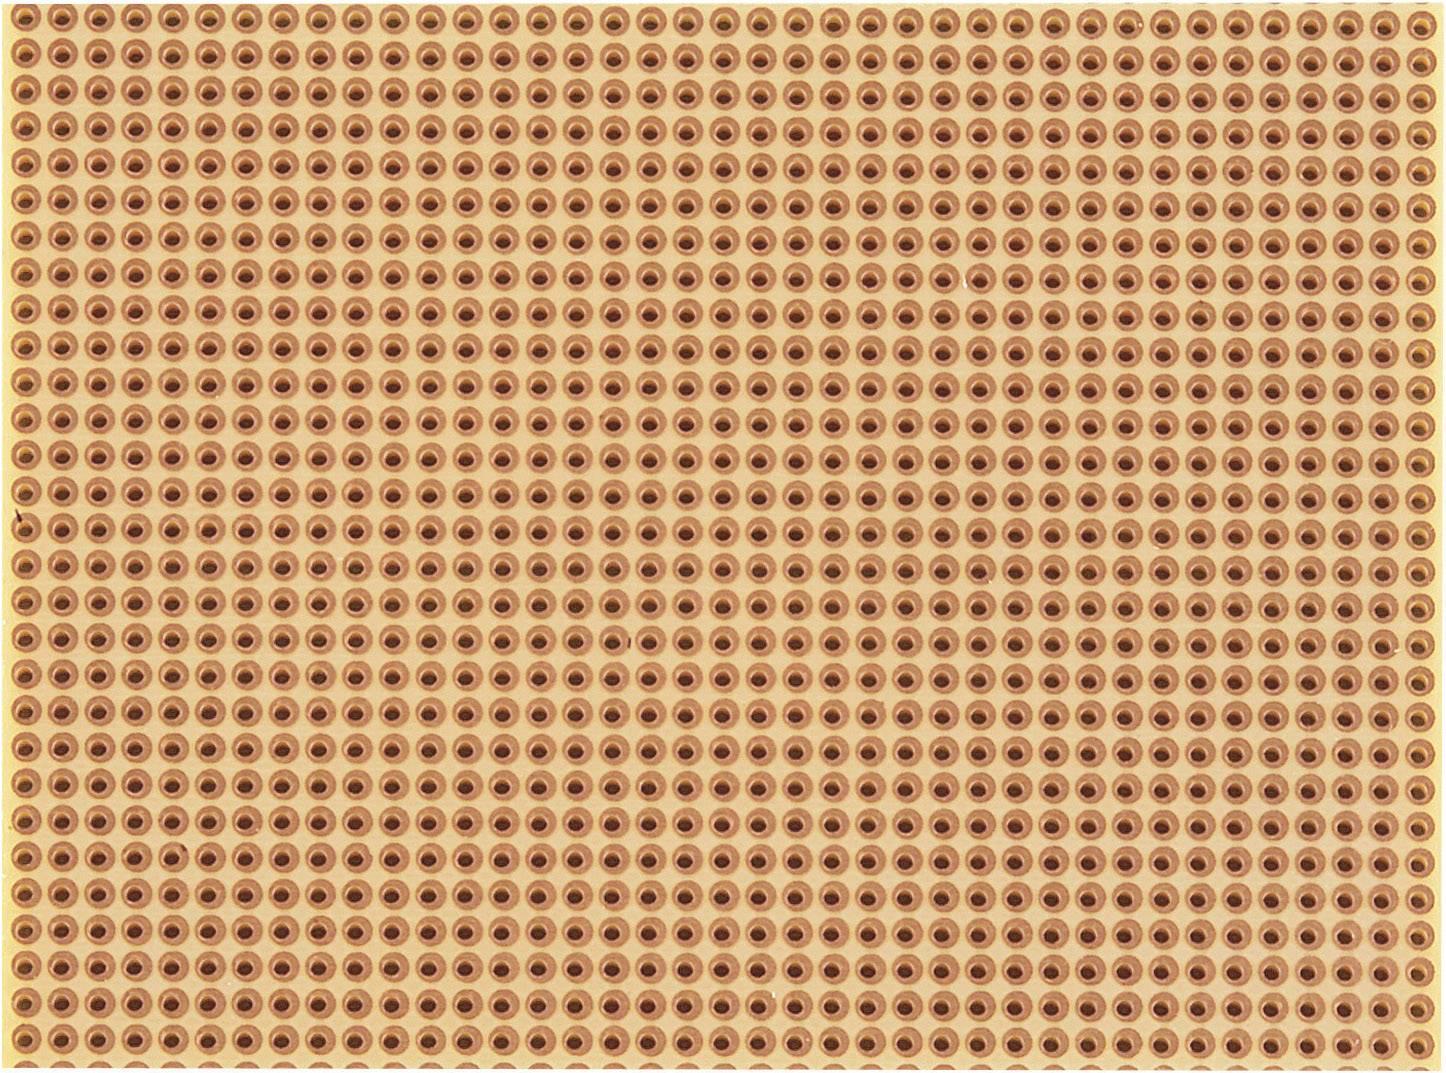 Experimentální deska s pájecími body 811-2 HP 100 x 75